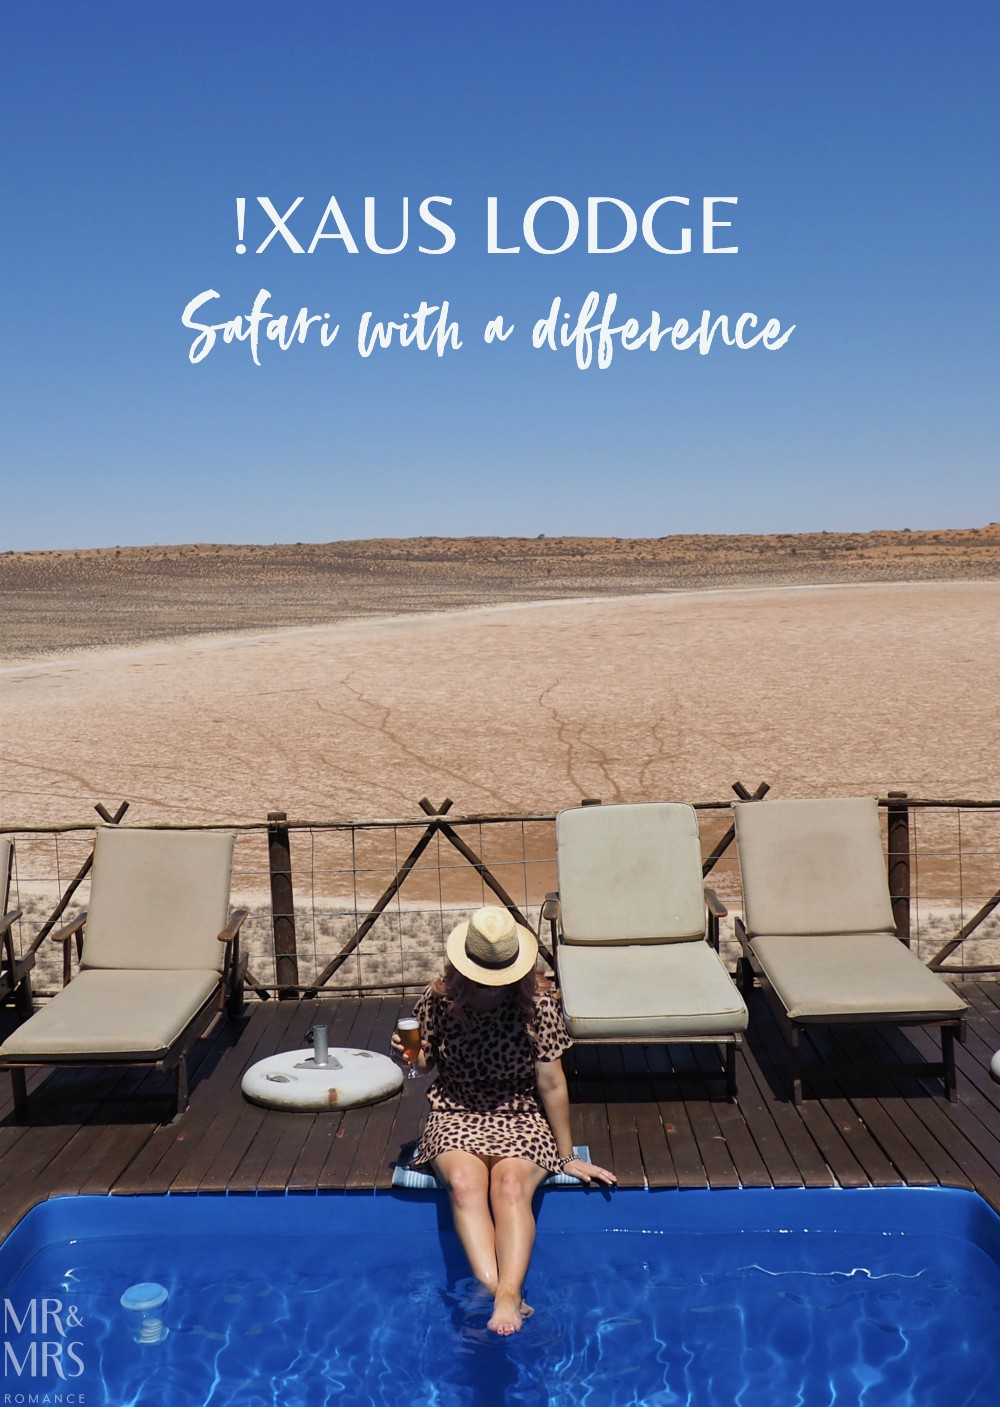 Xaus Lodge Kgalagadi Transfrontier Park, Kalahari Desert safari, South Africa